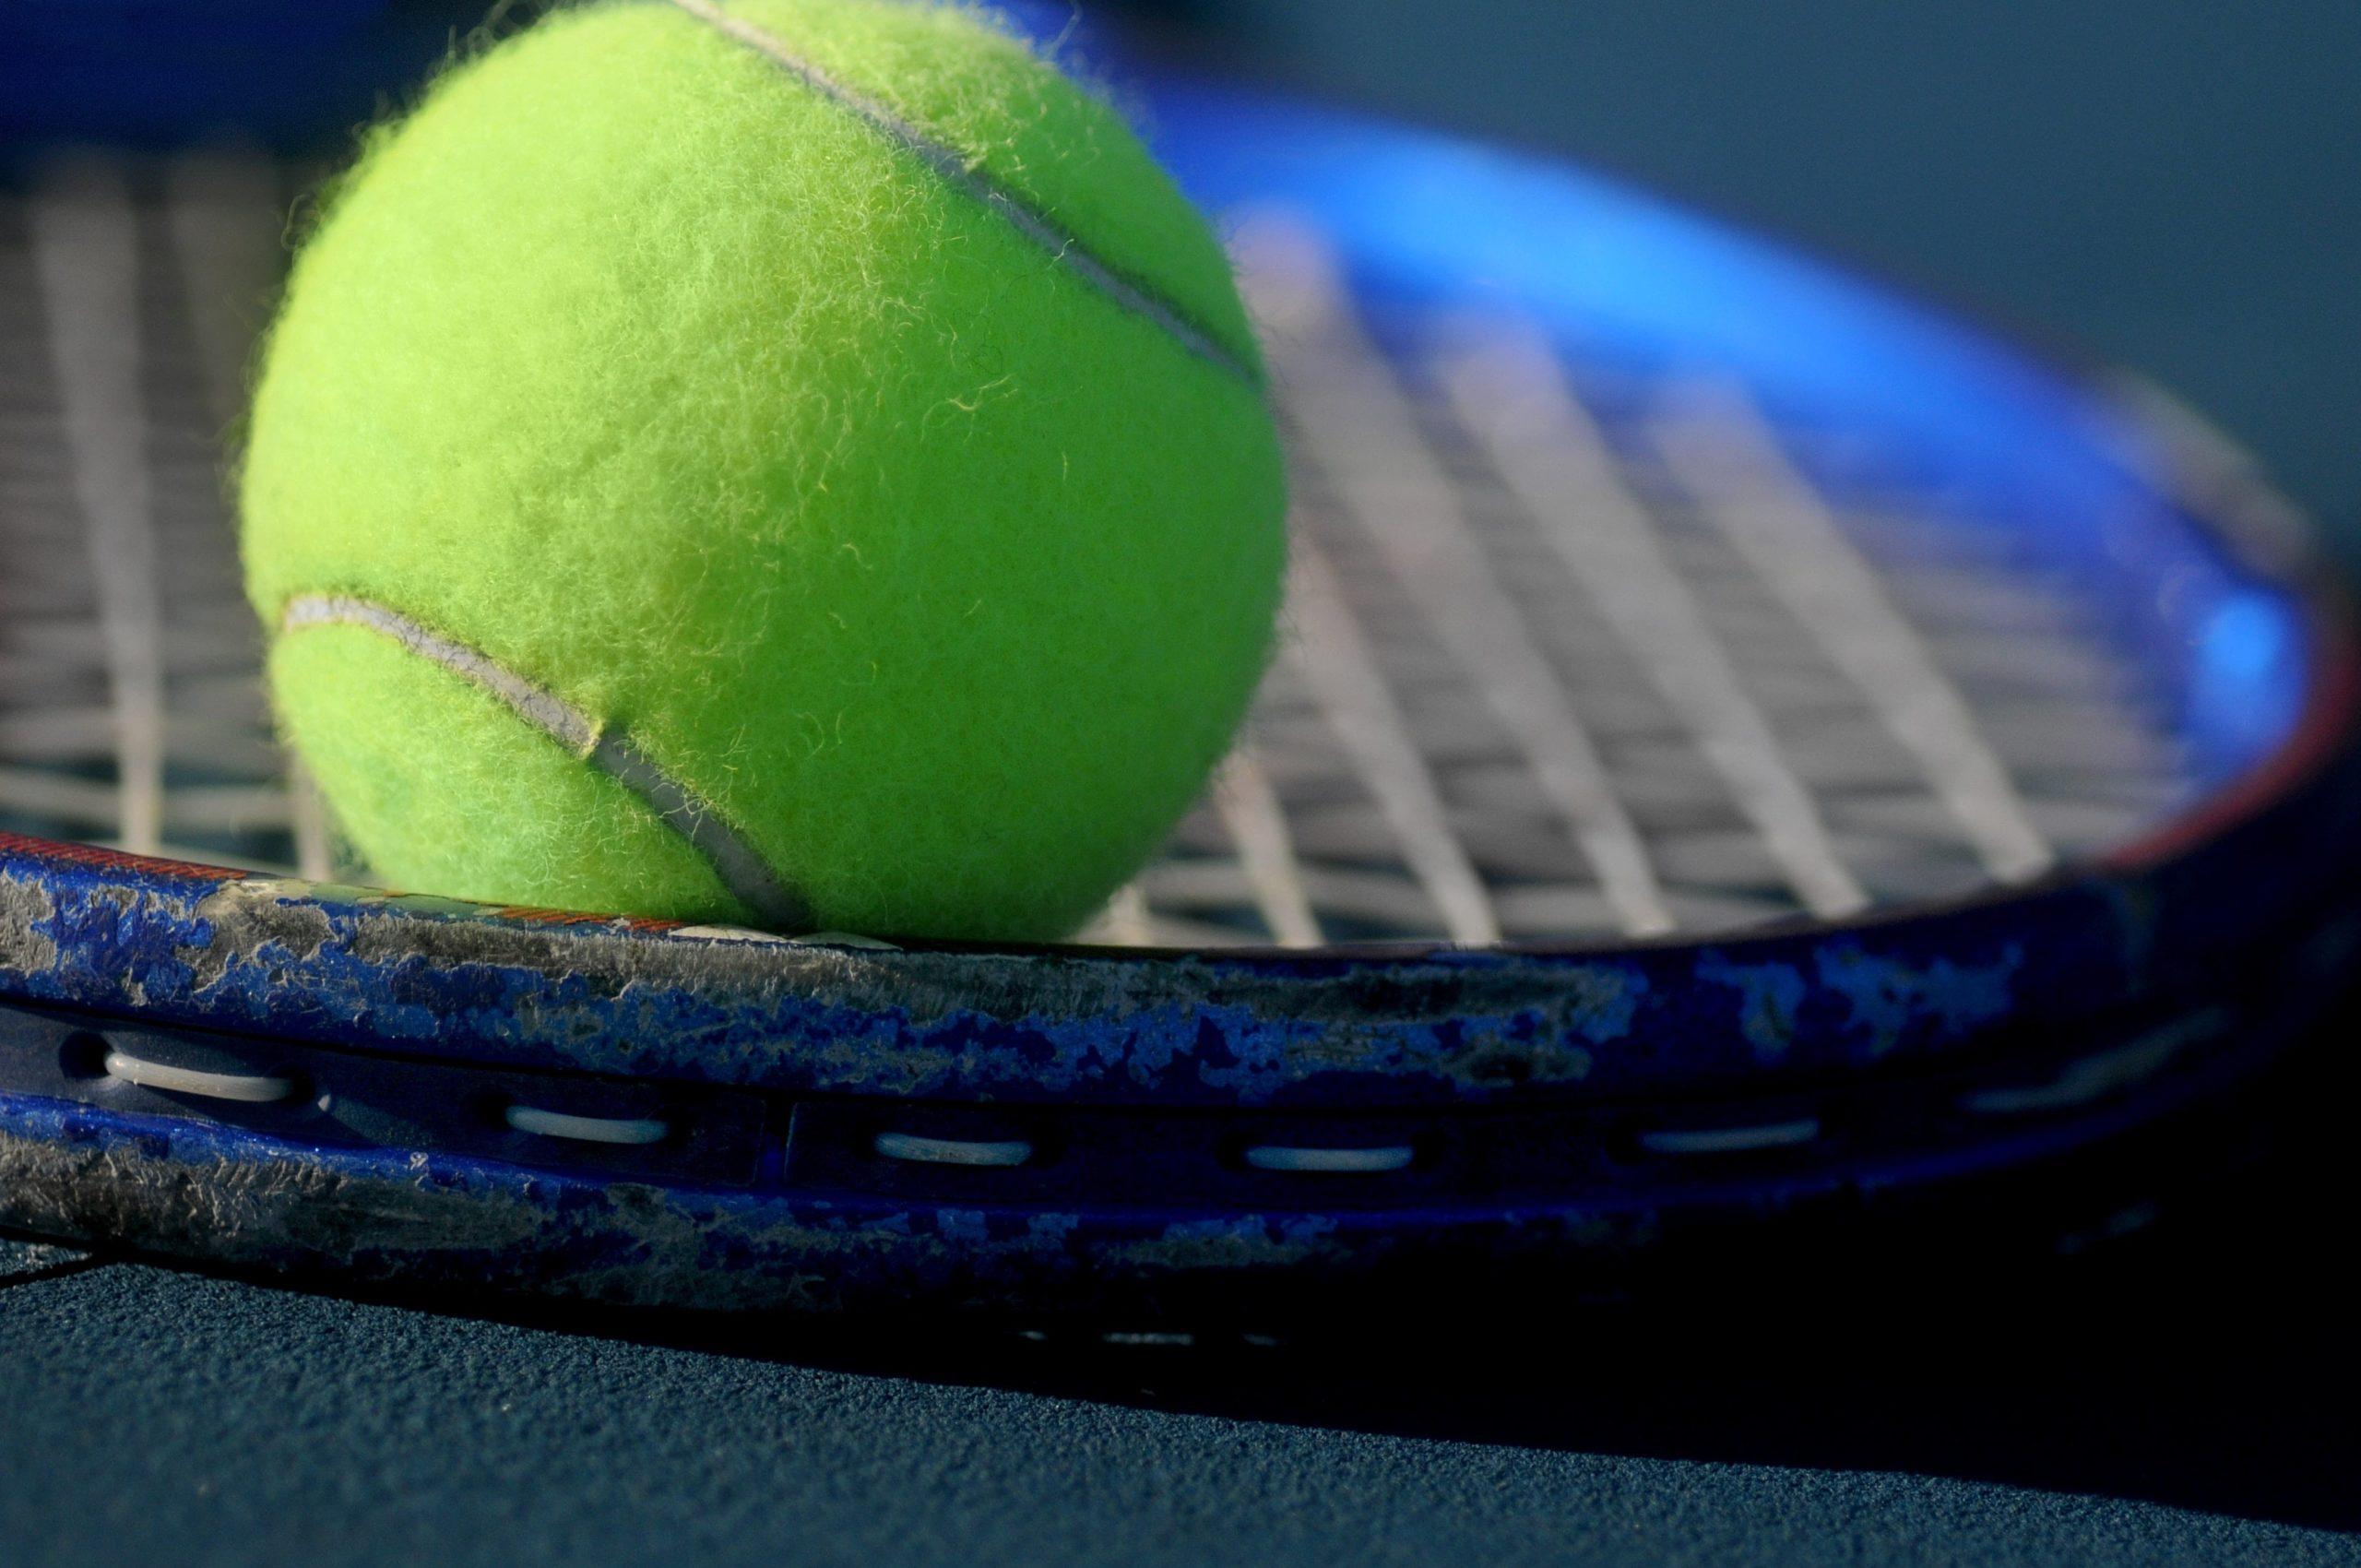 Laoli_Vital_Sehne-Tennisarm-Tennisellbogen_Symptome-Tennisspieler